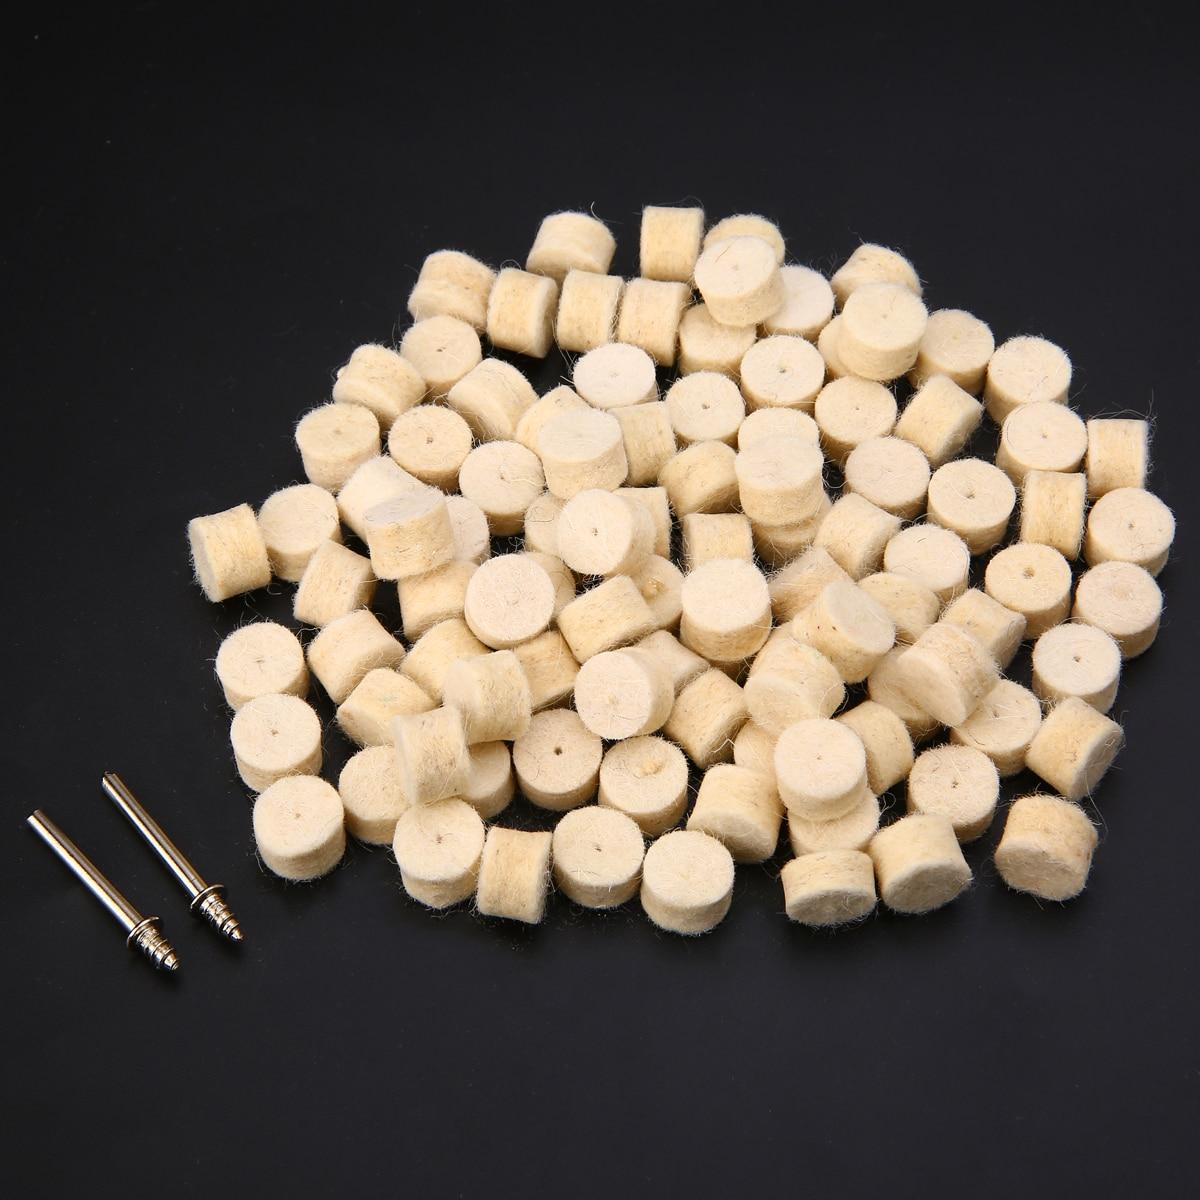 100pcs 13mm Wool Felt Polishing Buffing Wheel Grinding Wheels Polishing Buffing Pad With 2 Shanks For Abrasive Tools